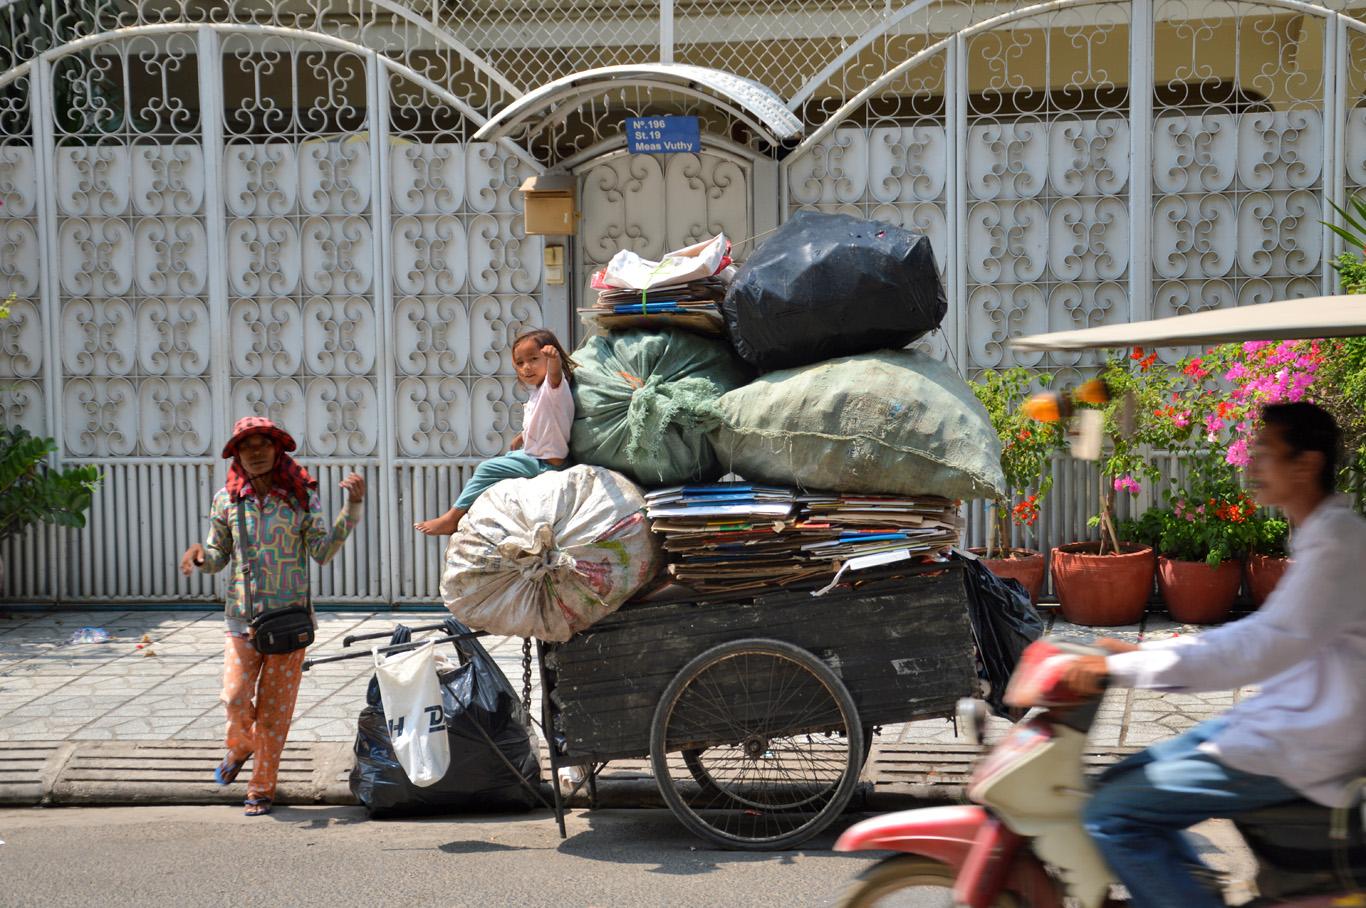 Streets in Phnom Penh